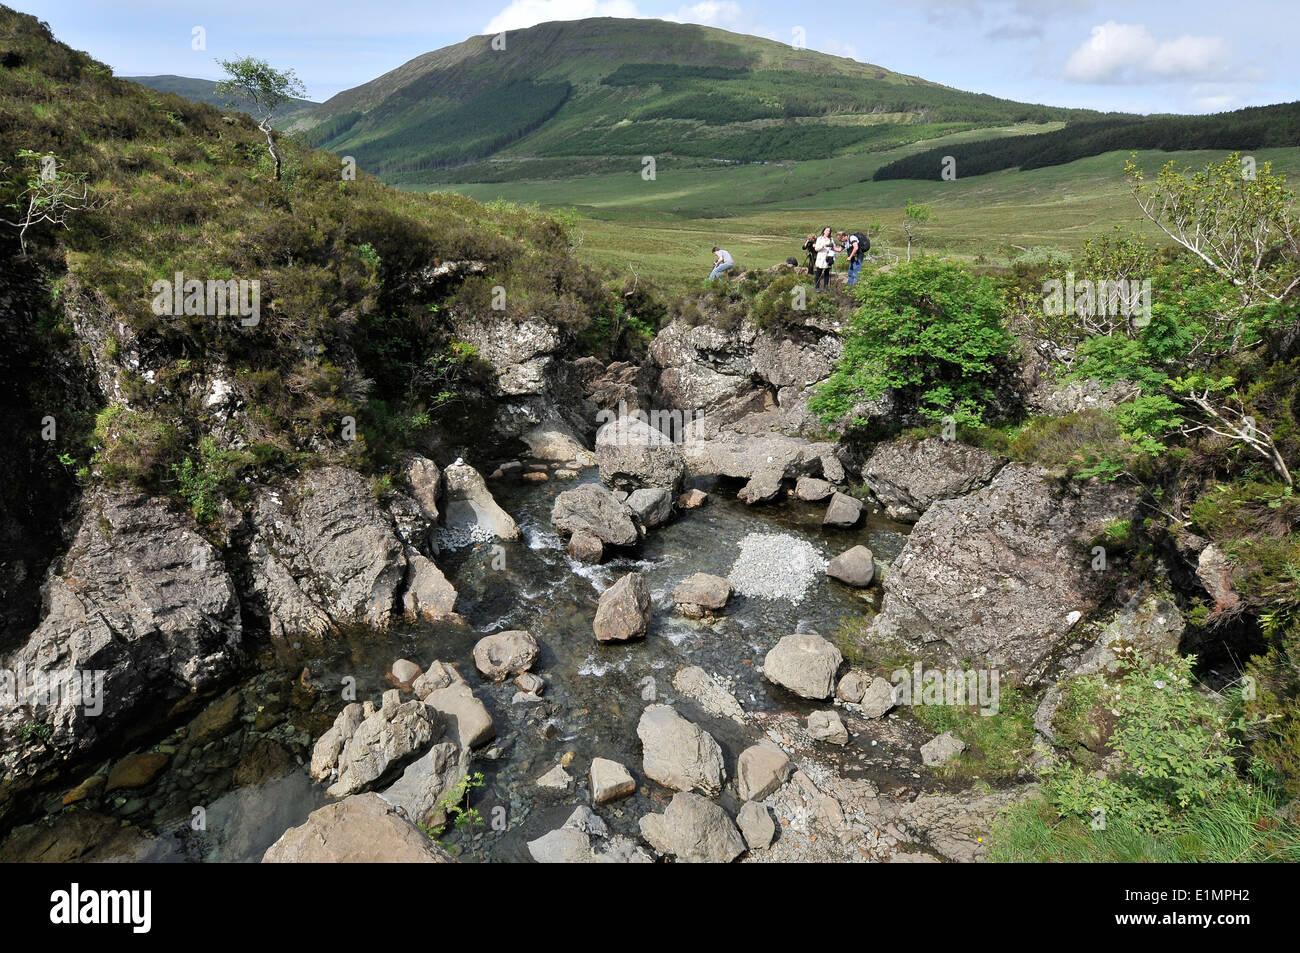 Fairy pools on the Isle of Skye. - Stock Image